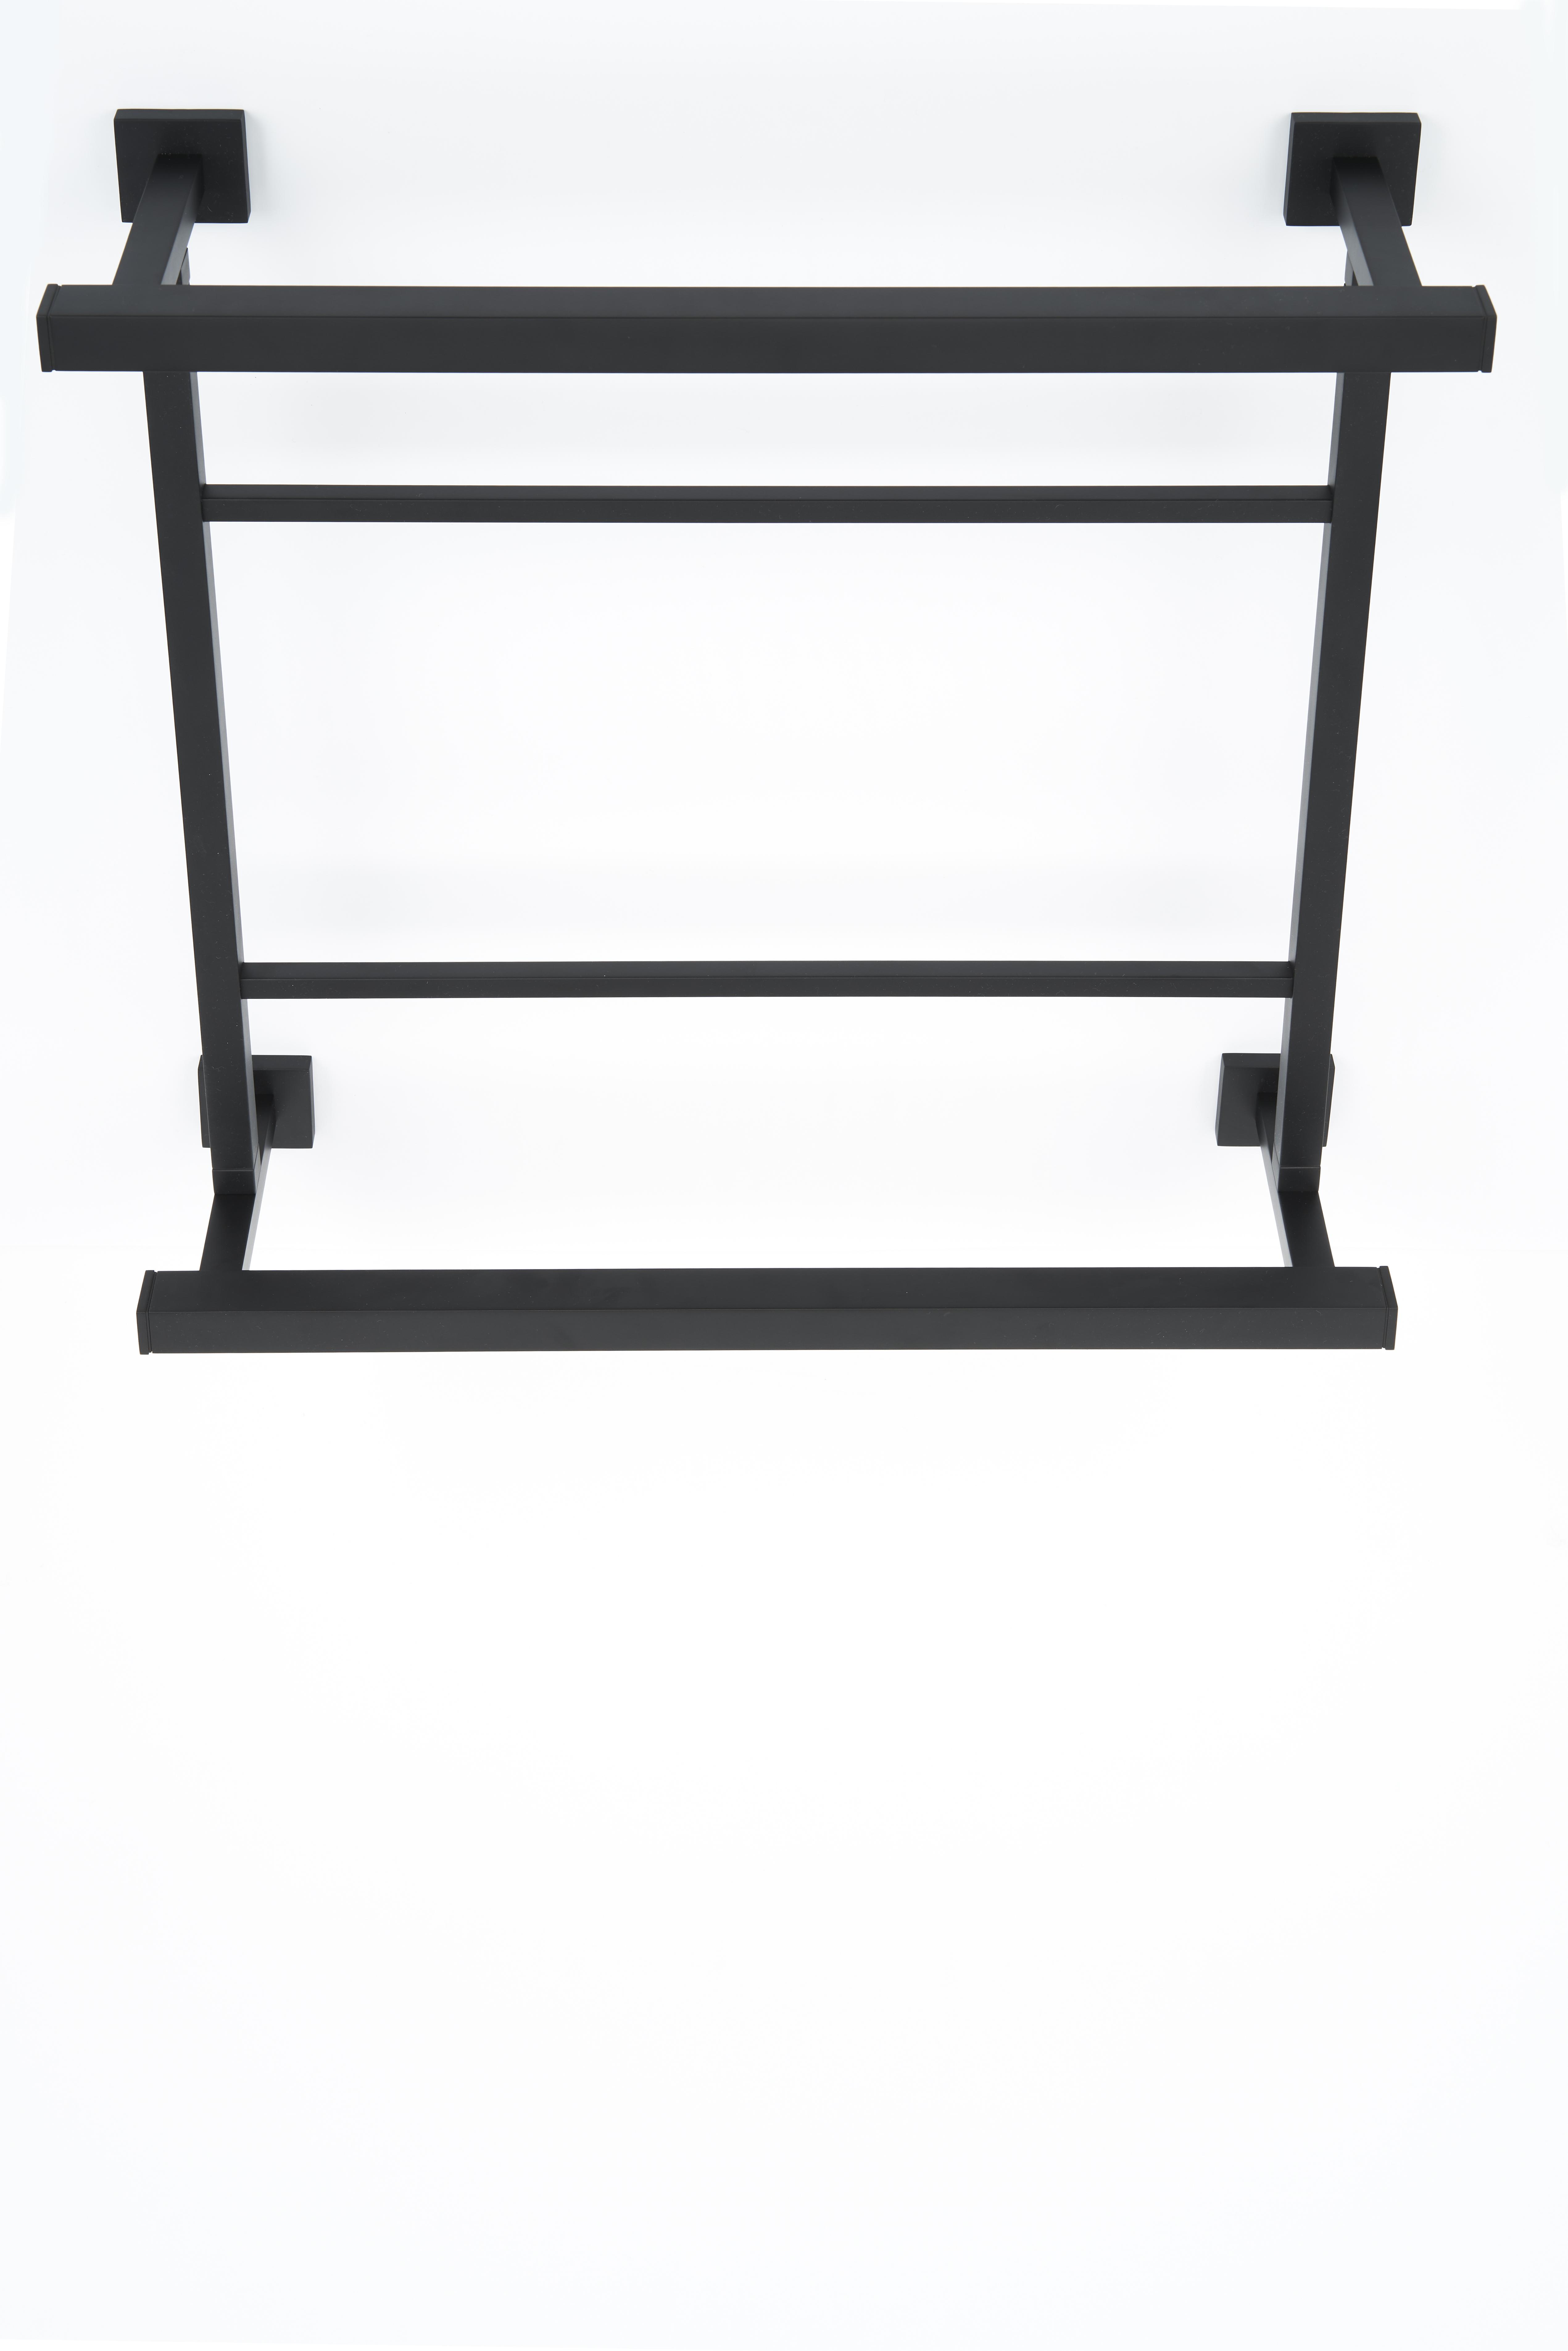 master z doublerailpersonalvaletrollingrackblack product hayneedle rail personal rack double rolling cfm valet black